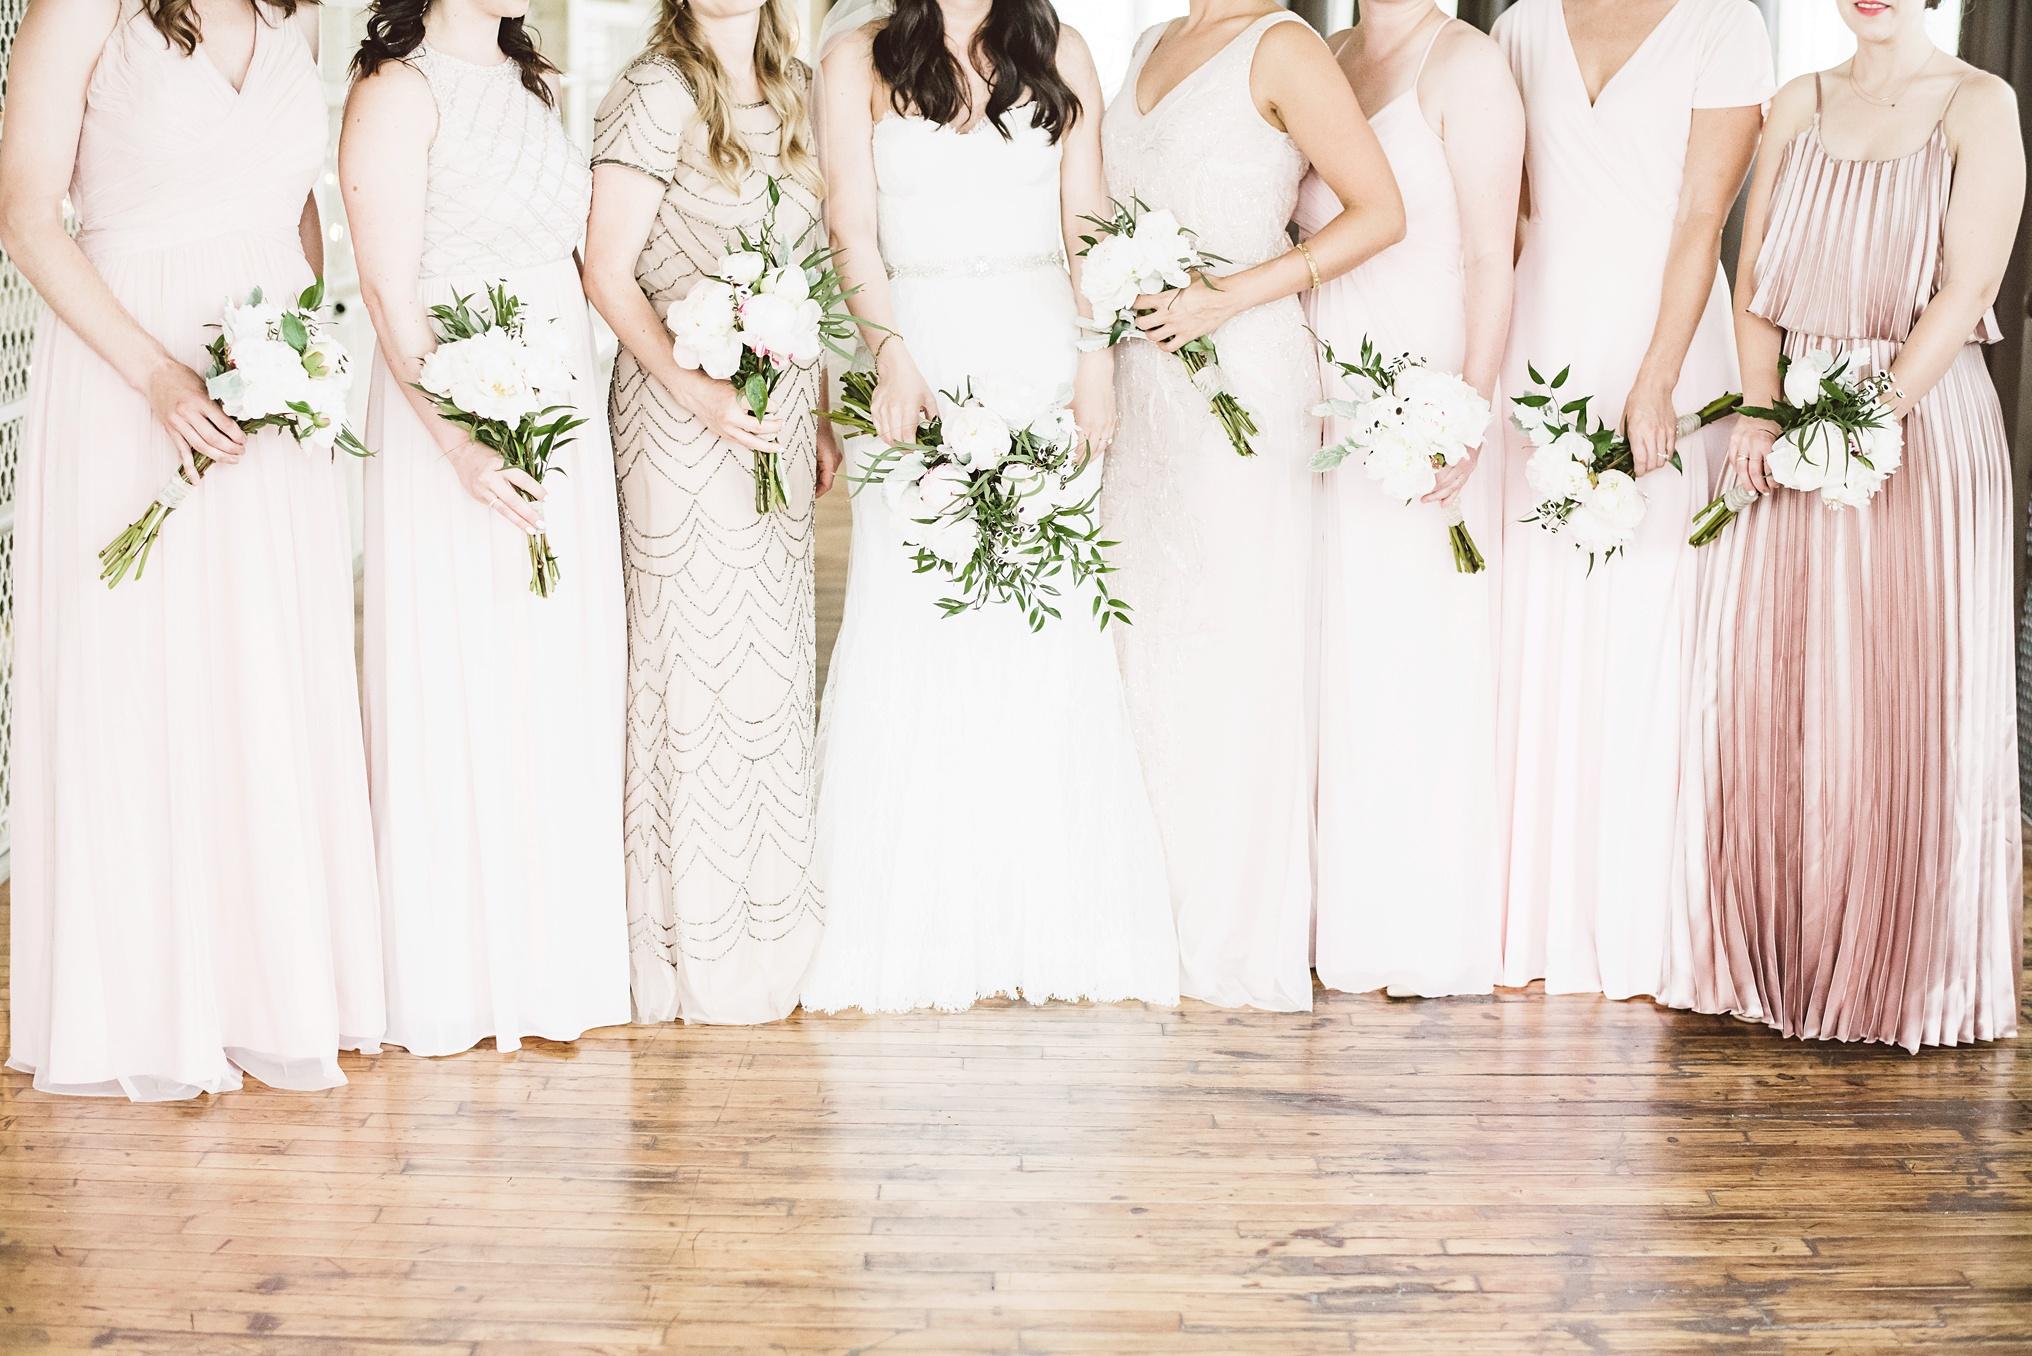 best_wedding_photography_2017_by_lucas_botz_photography_108.jpg